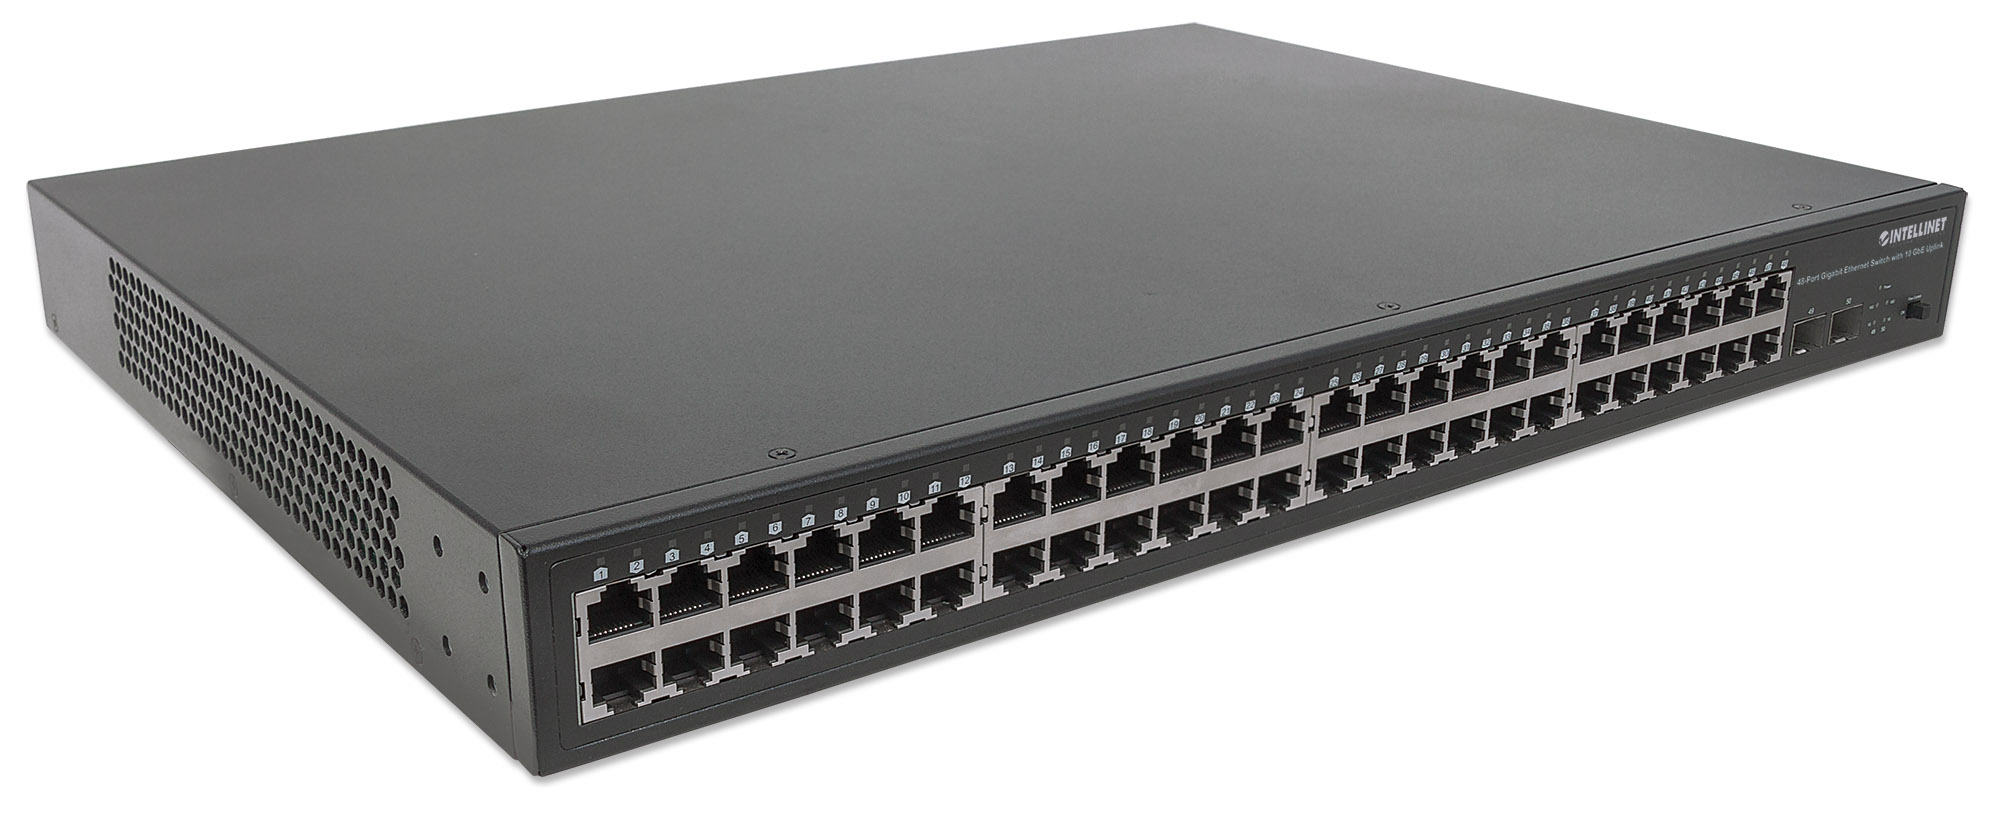 48-Port Gigabit Ethernet Switch with 10 GbE Uplink